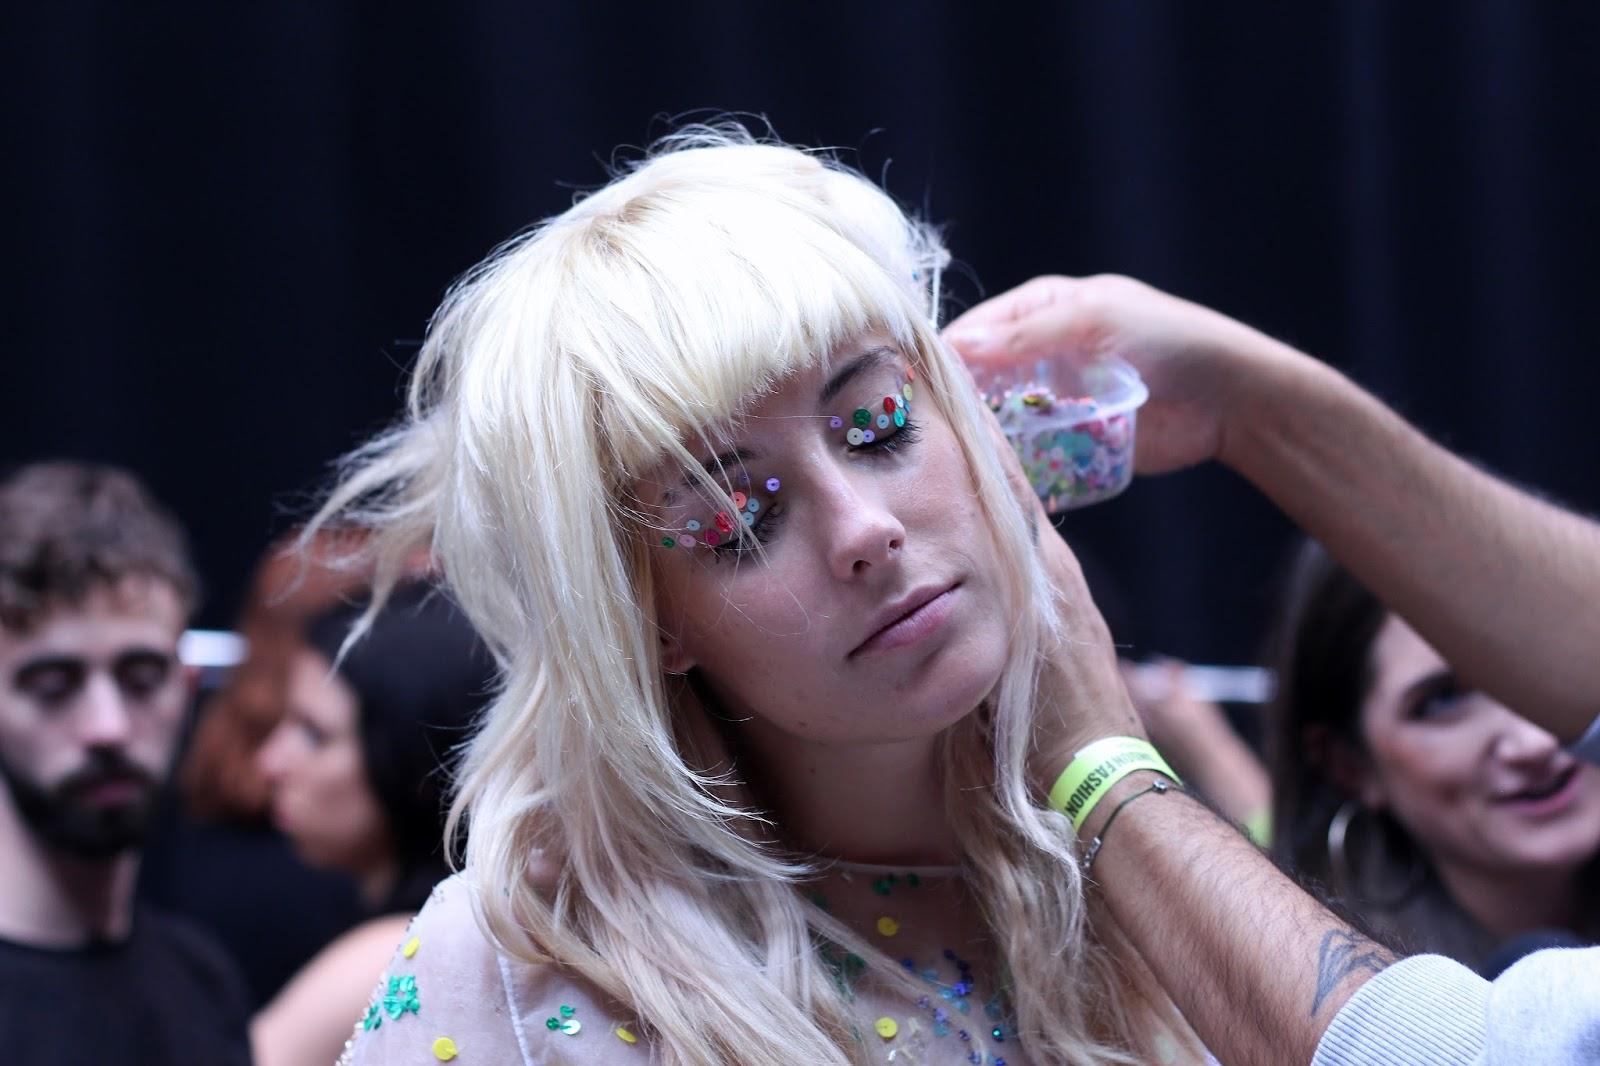 ashish ss16 backstage hair chloe norgaard